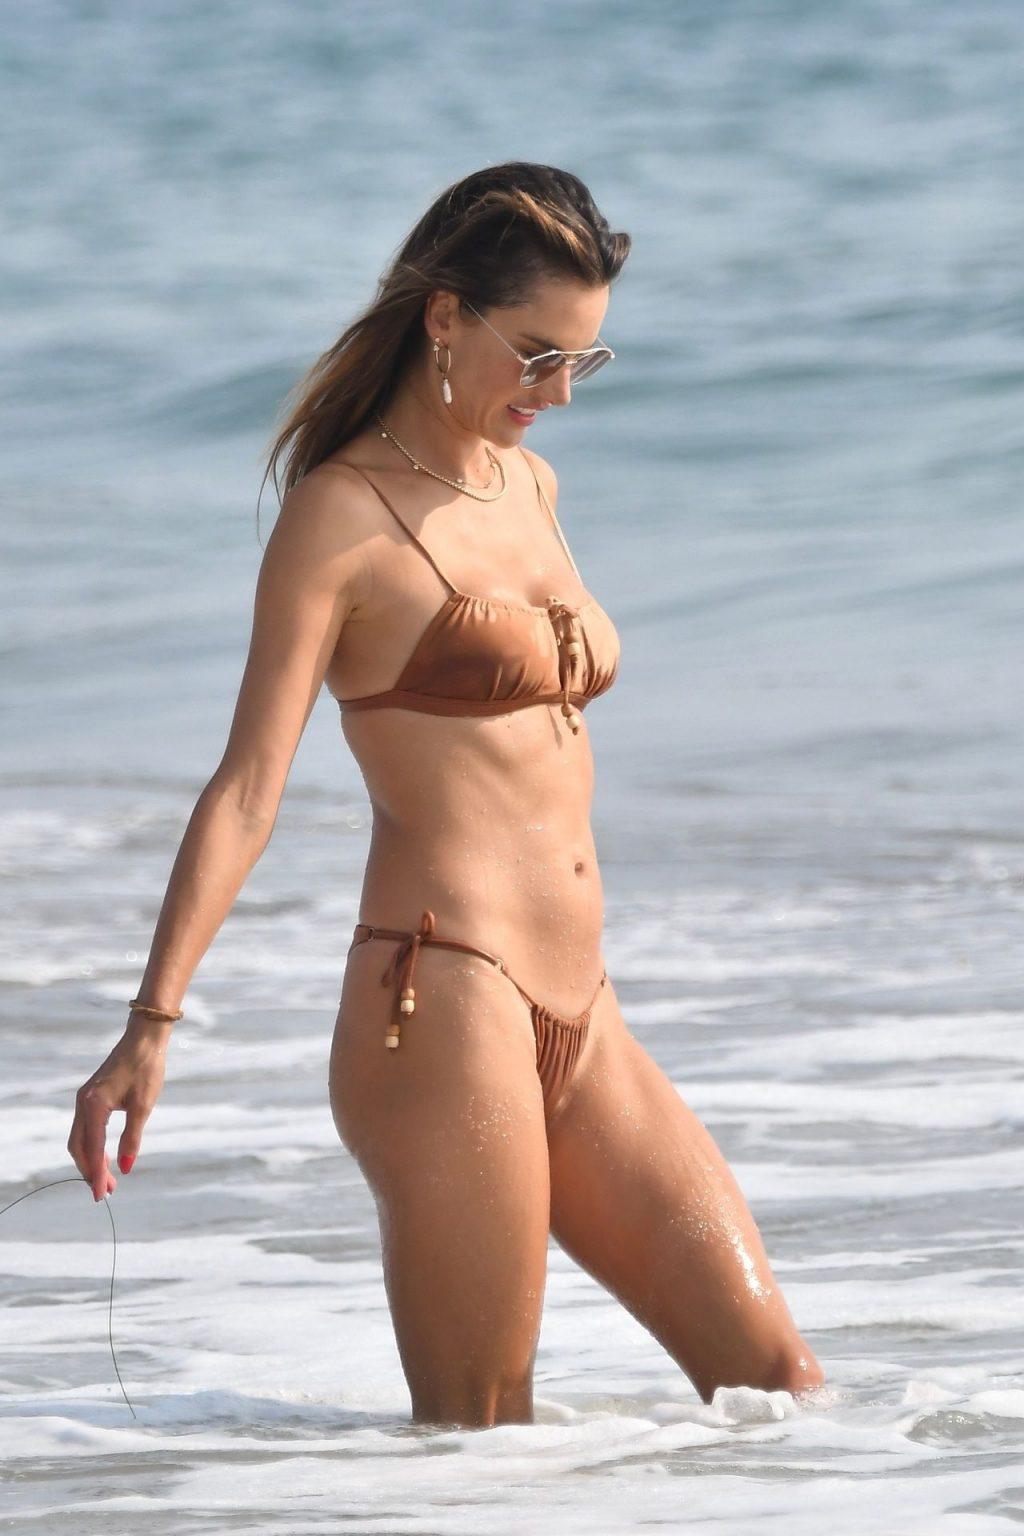 Alessandra Ambrosio Soaks Up the Sun on Santa Monica Beach (49 Photos)